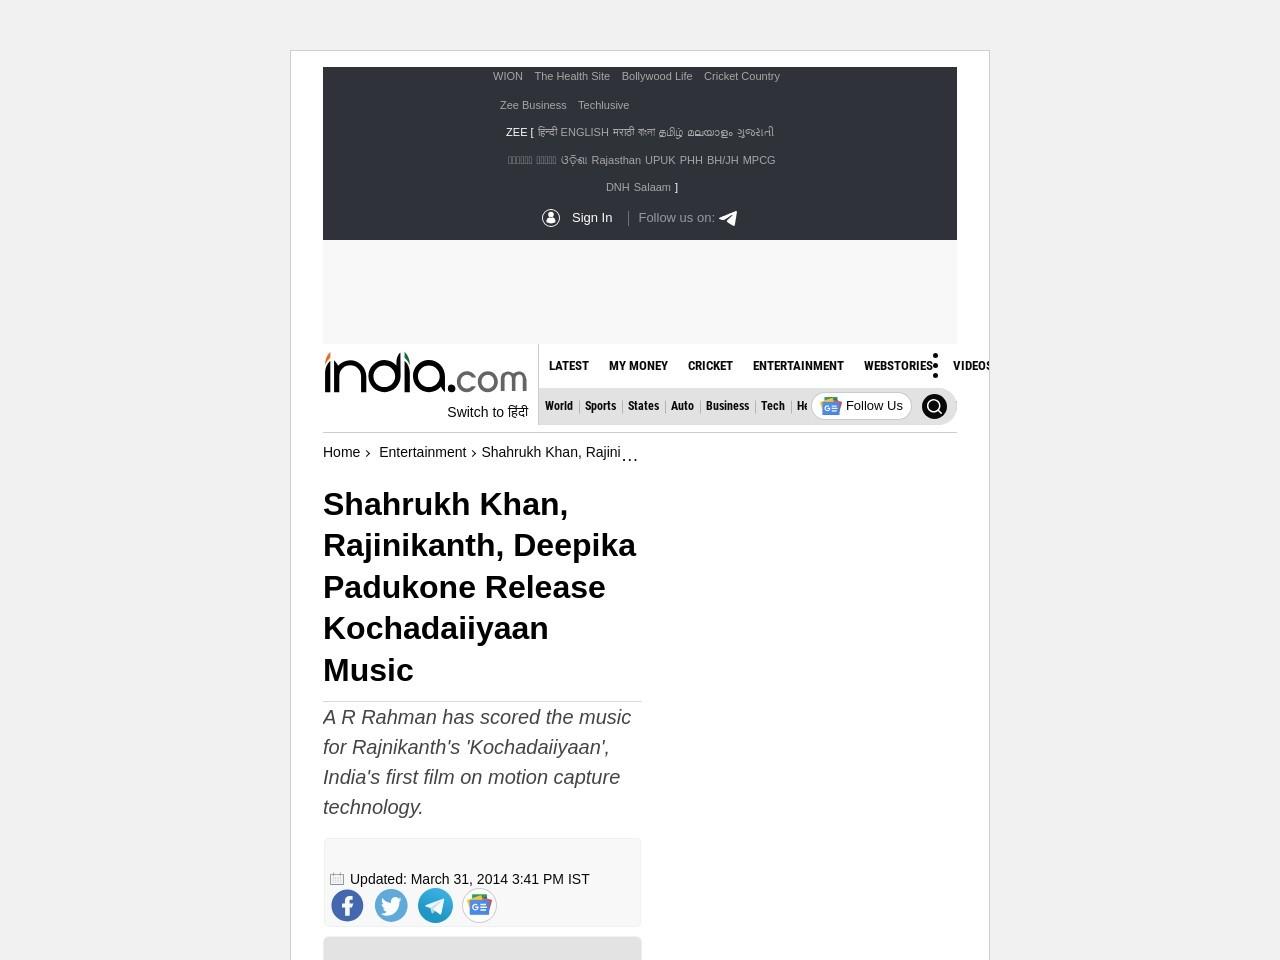 Shahrukh Khan, Rajinikanth, Deepika Padukone release … – India